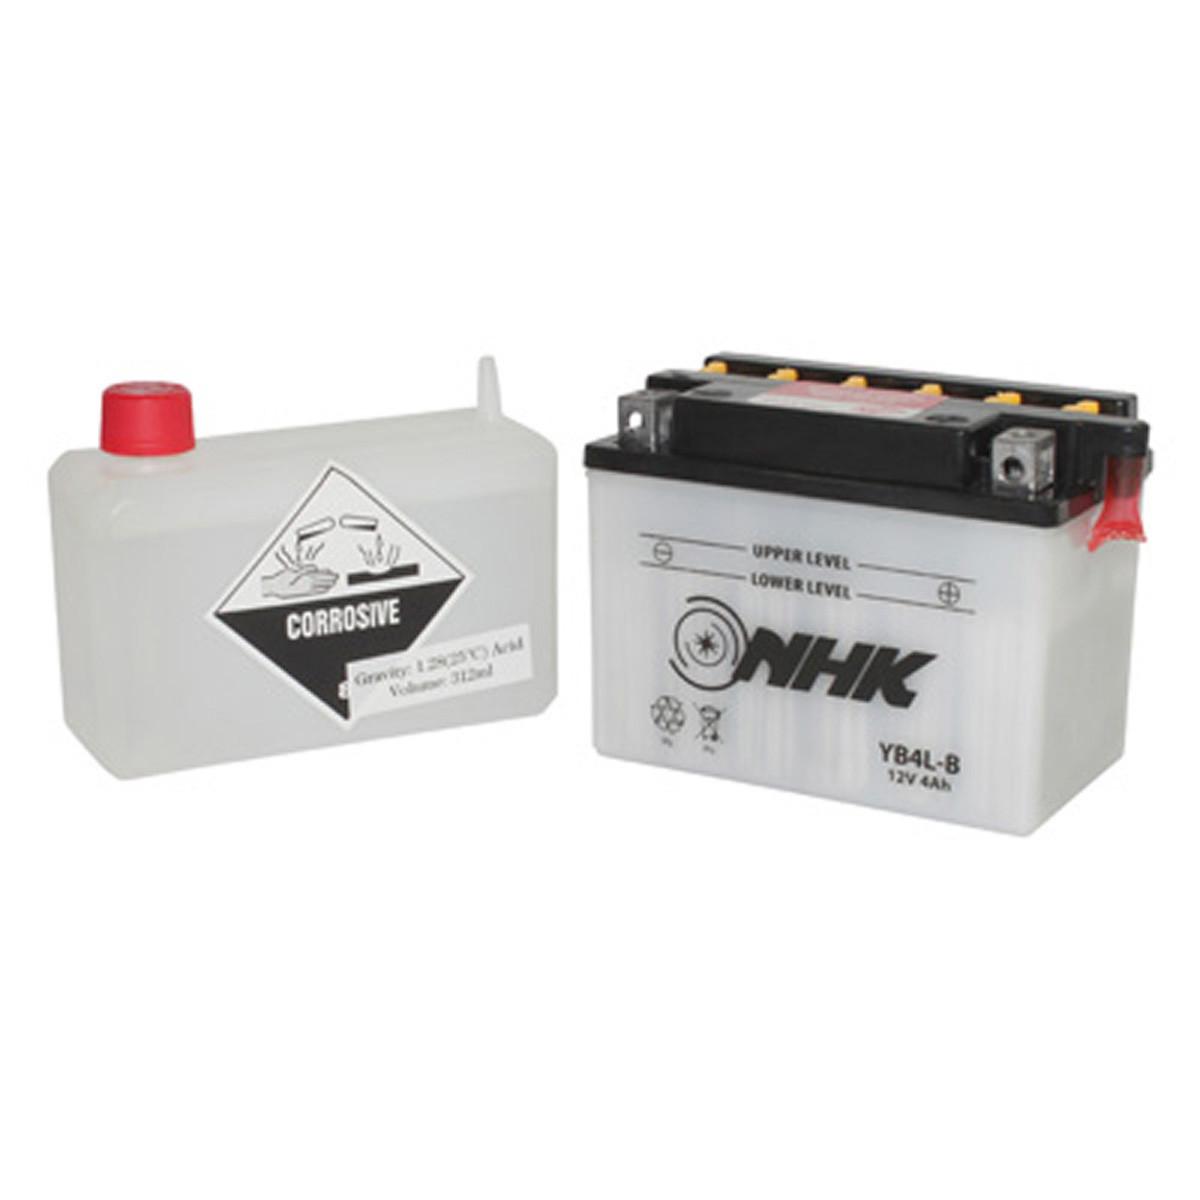 Batterie 12V 4Ah YB4LB - NHK